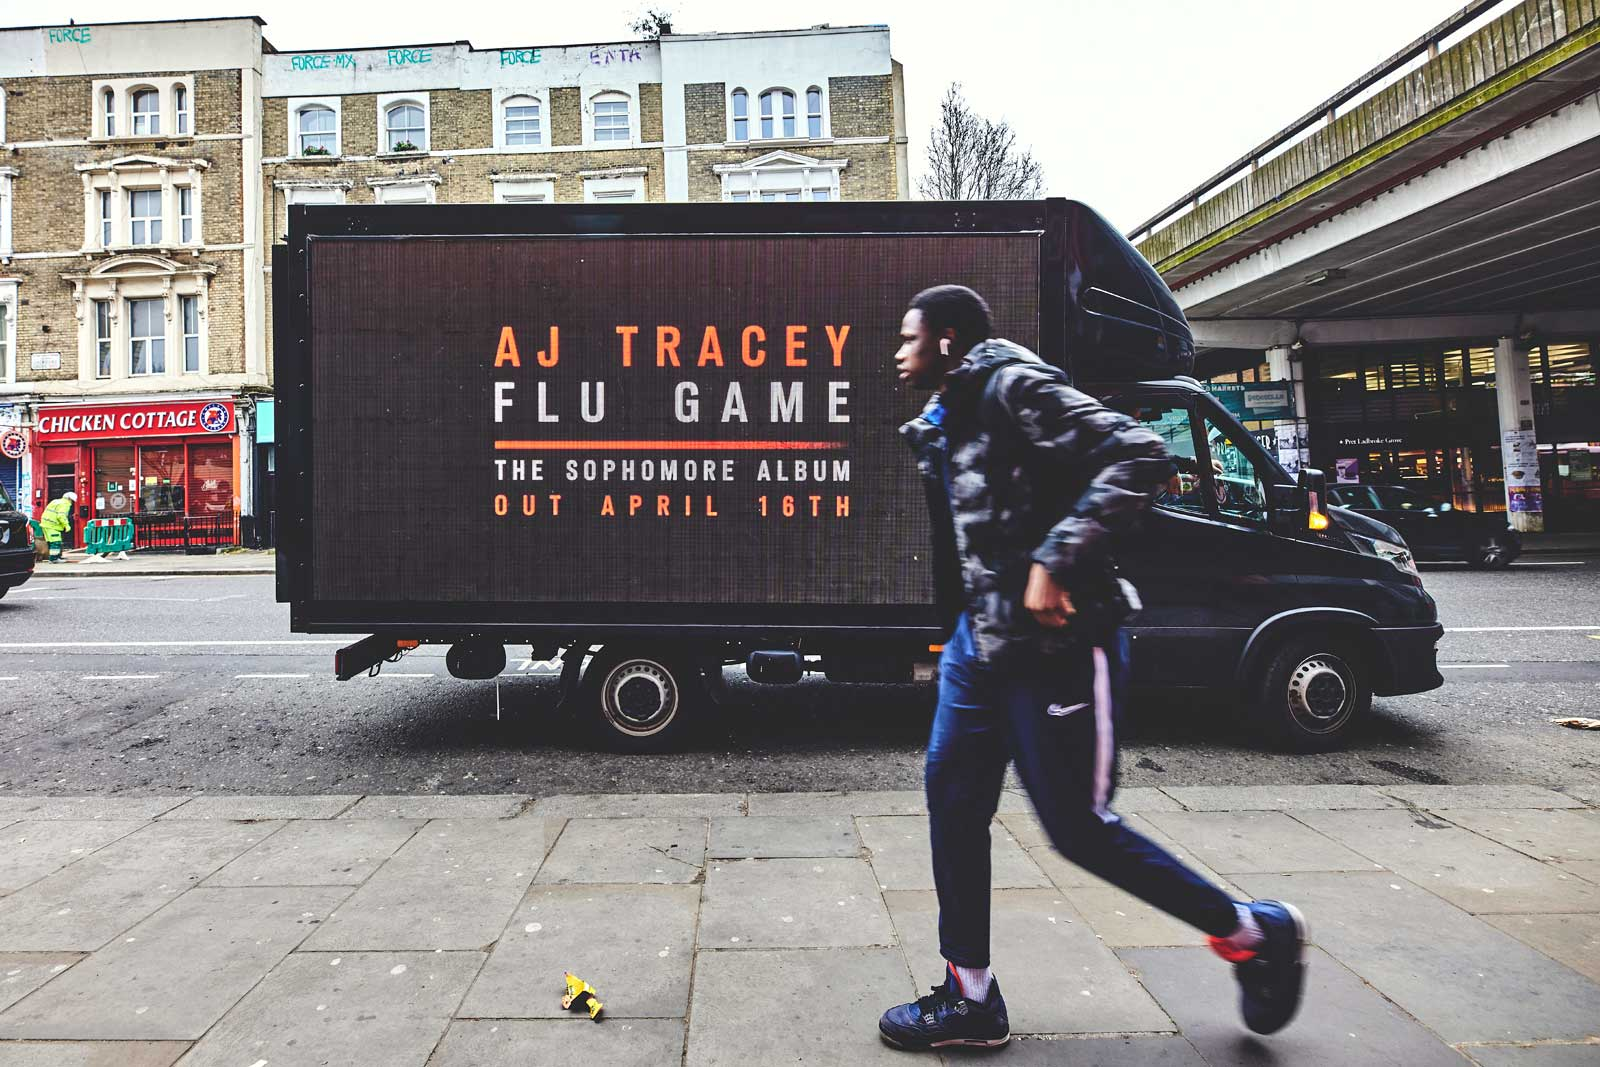 AJ Tracey: Flu Game